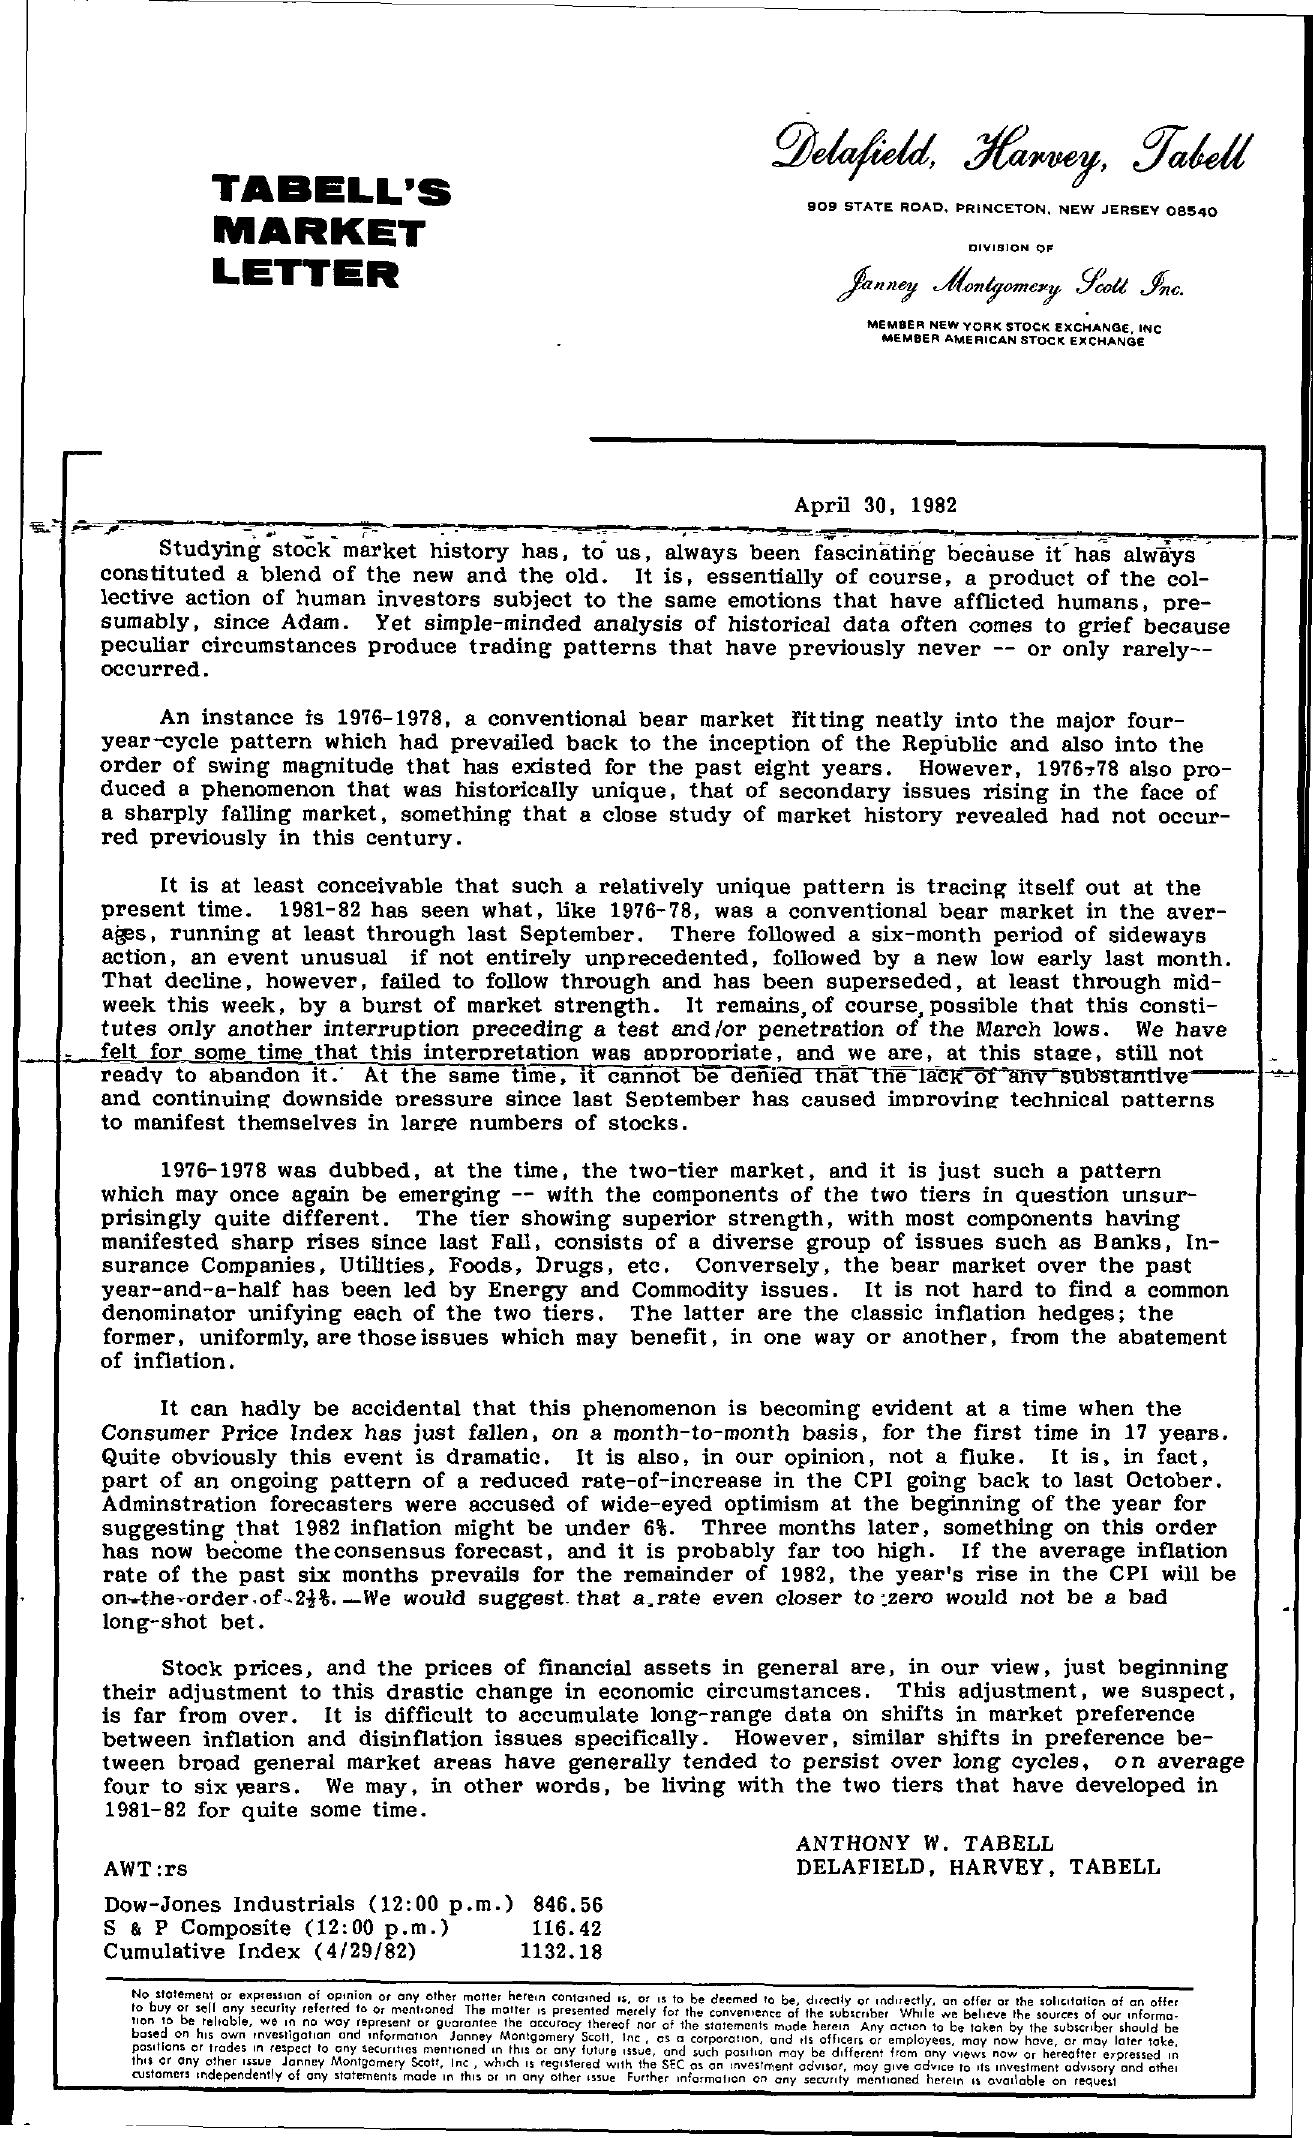 Tabell's Market Letter - April 30, 1982